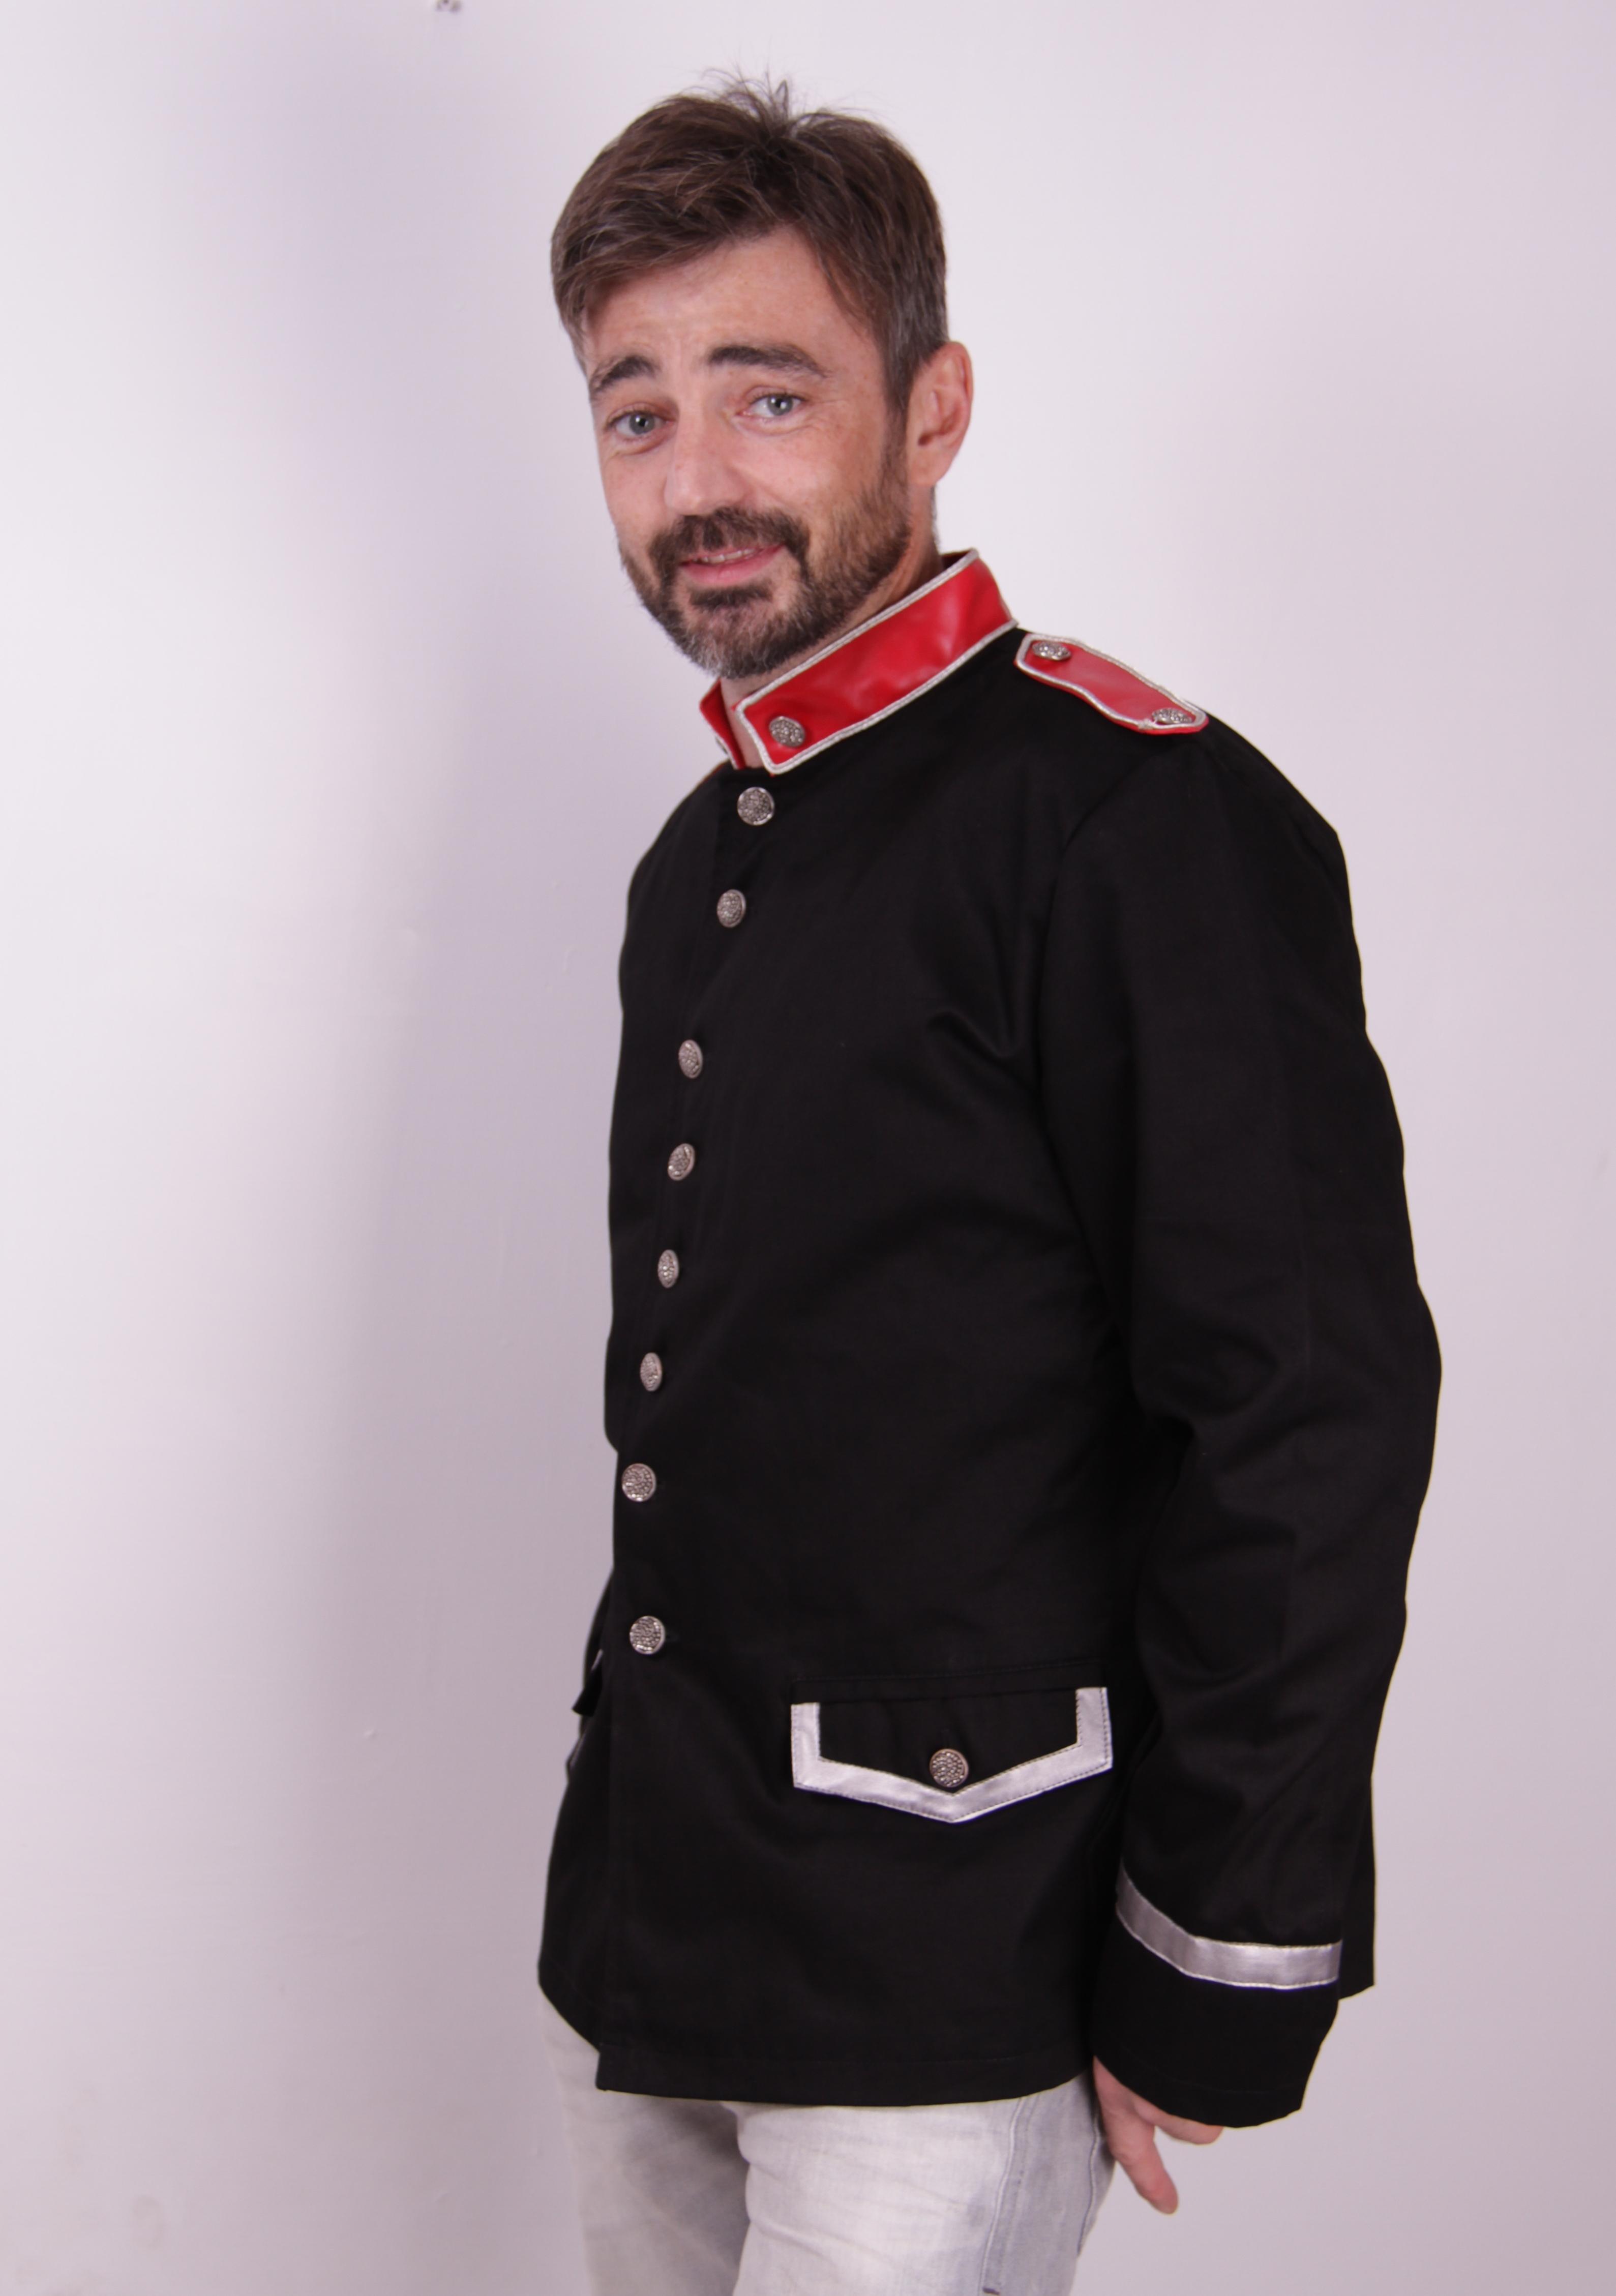 malik_guardsman_style_jacket_lady_ks_black_jackets_and_outerwear_4.JPG